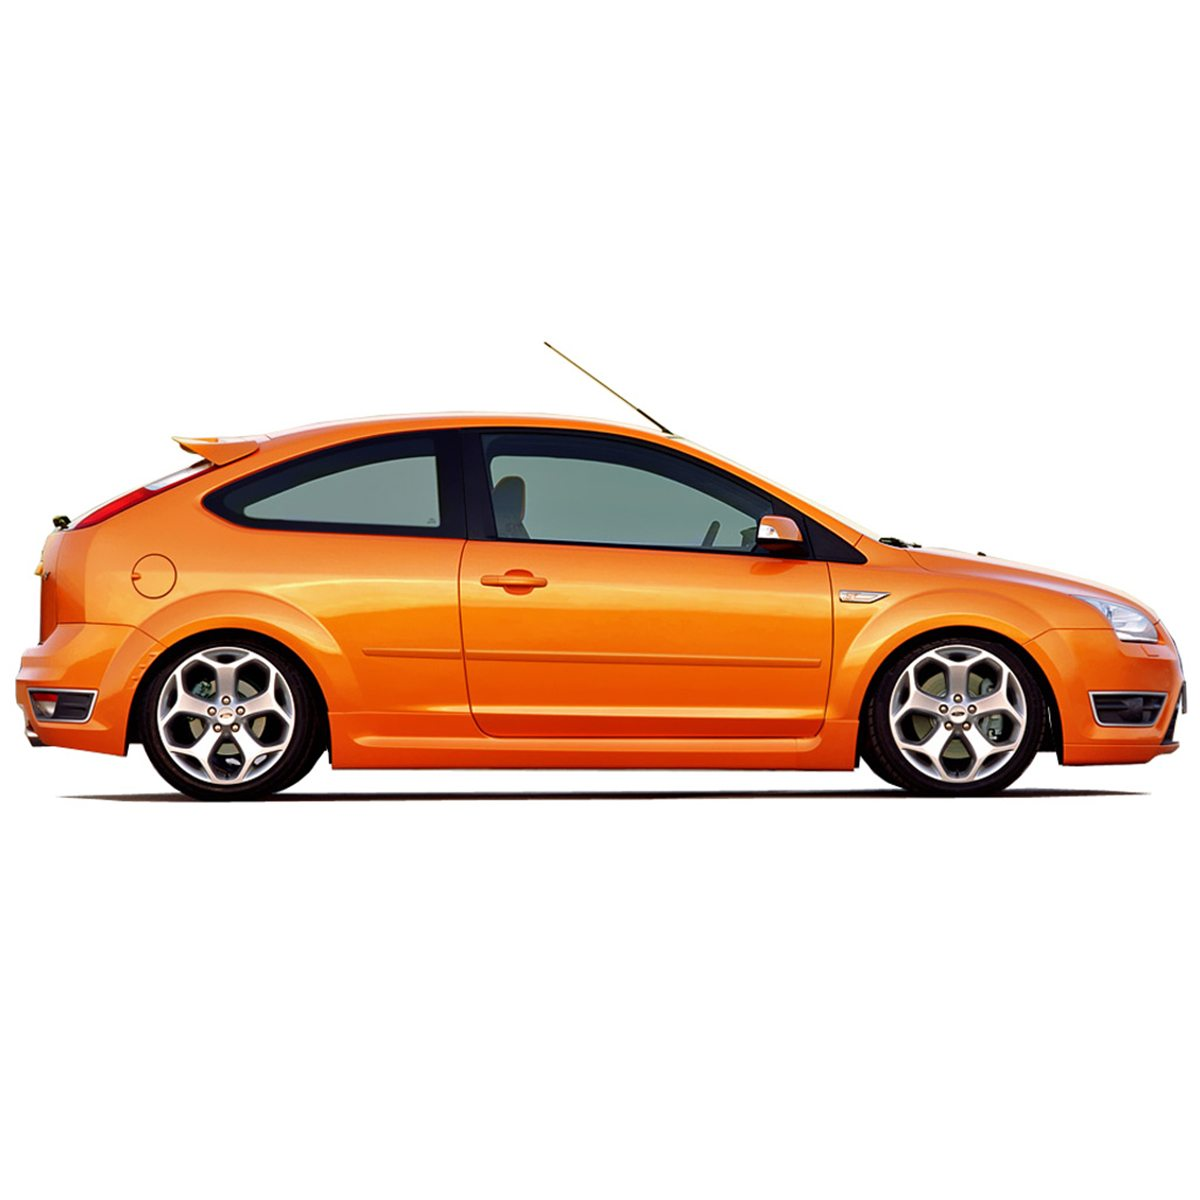 Ford-Focus-05-ST-Emb-EBU0480